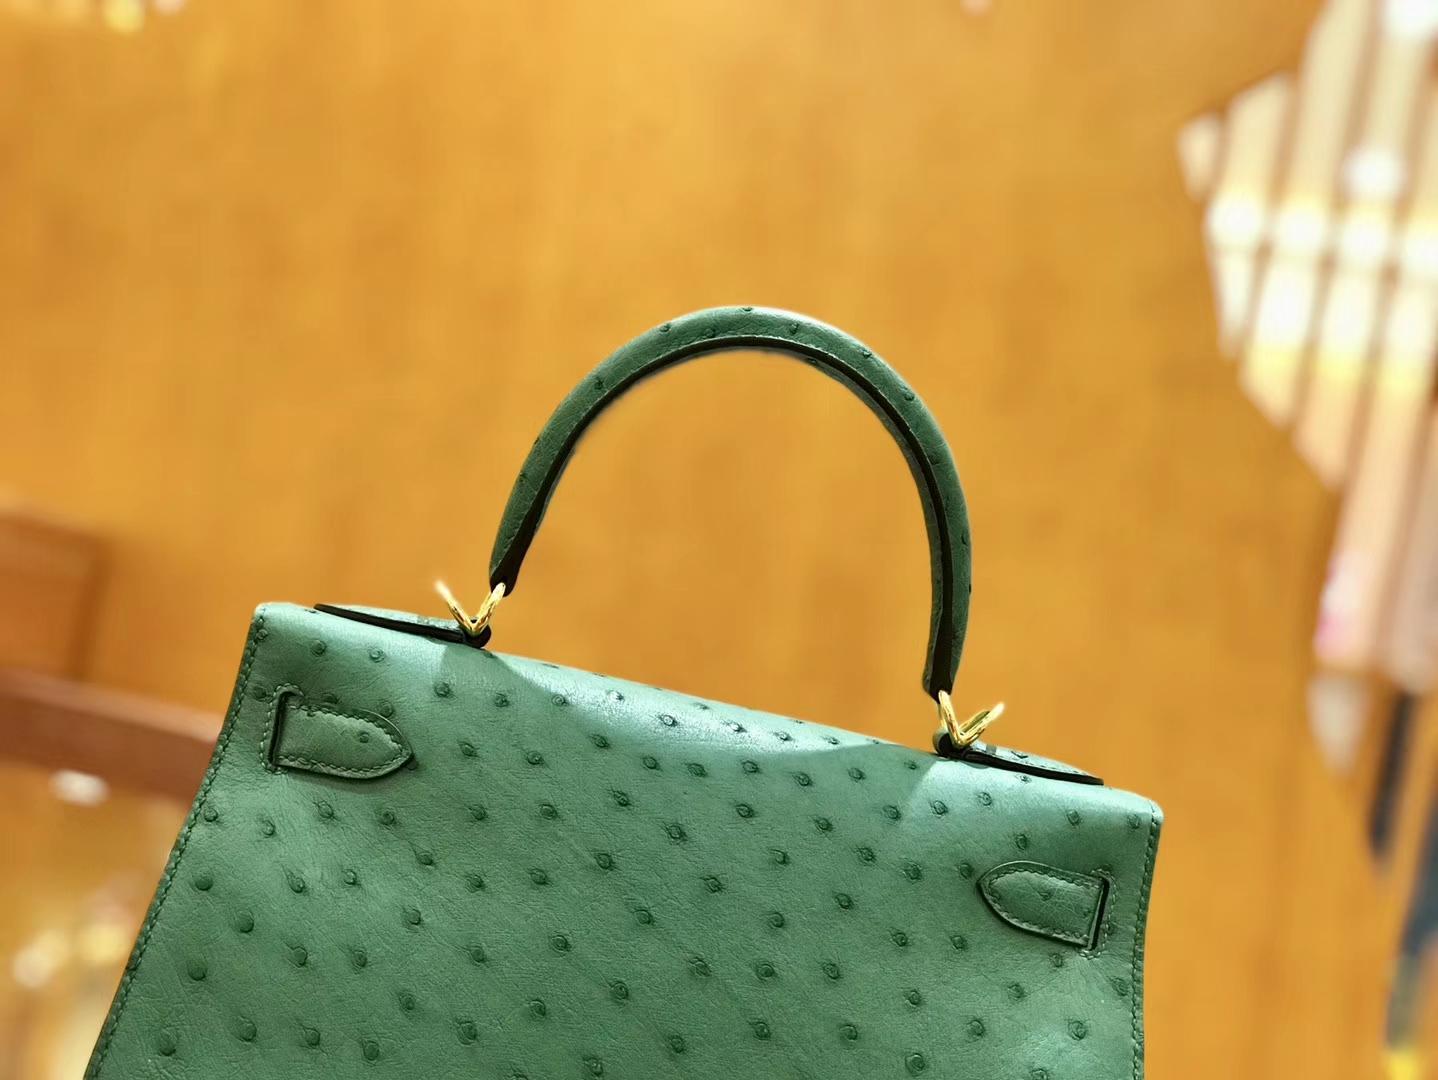 Hermès(爱马仕)Kelly 28cm 孔雀绿 金扣 鸵鸟皮 全手工缝制